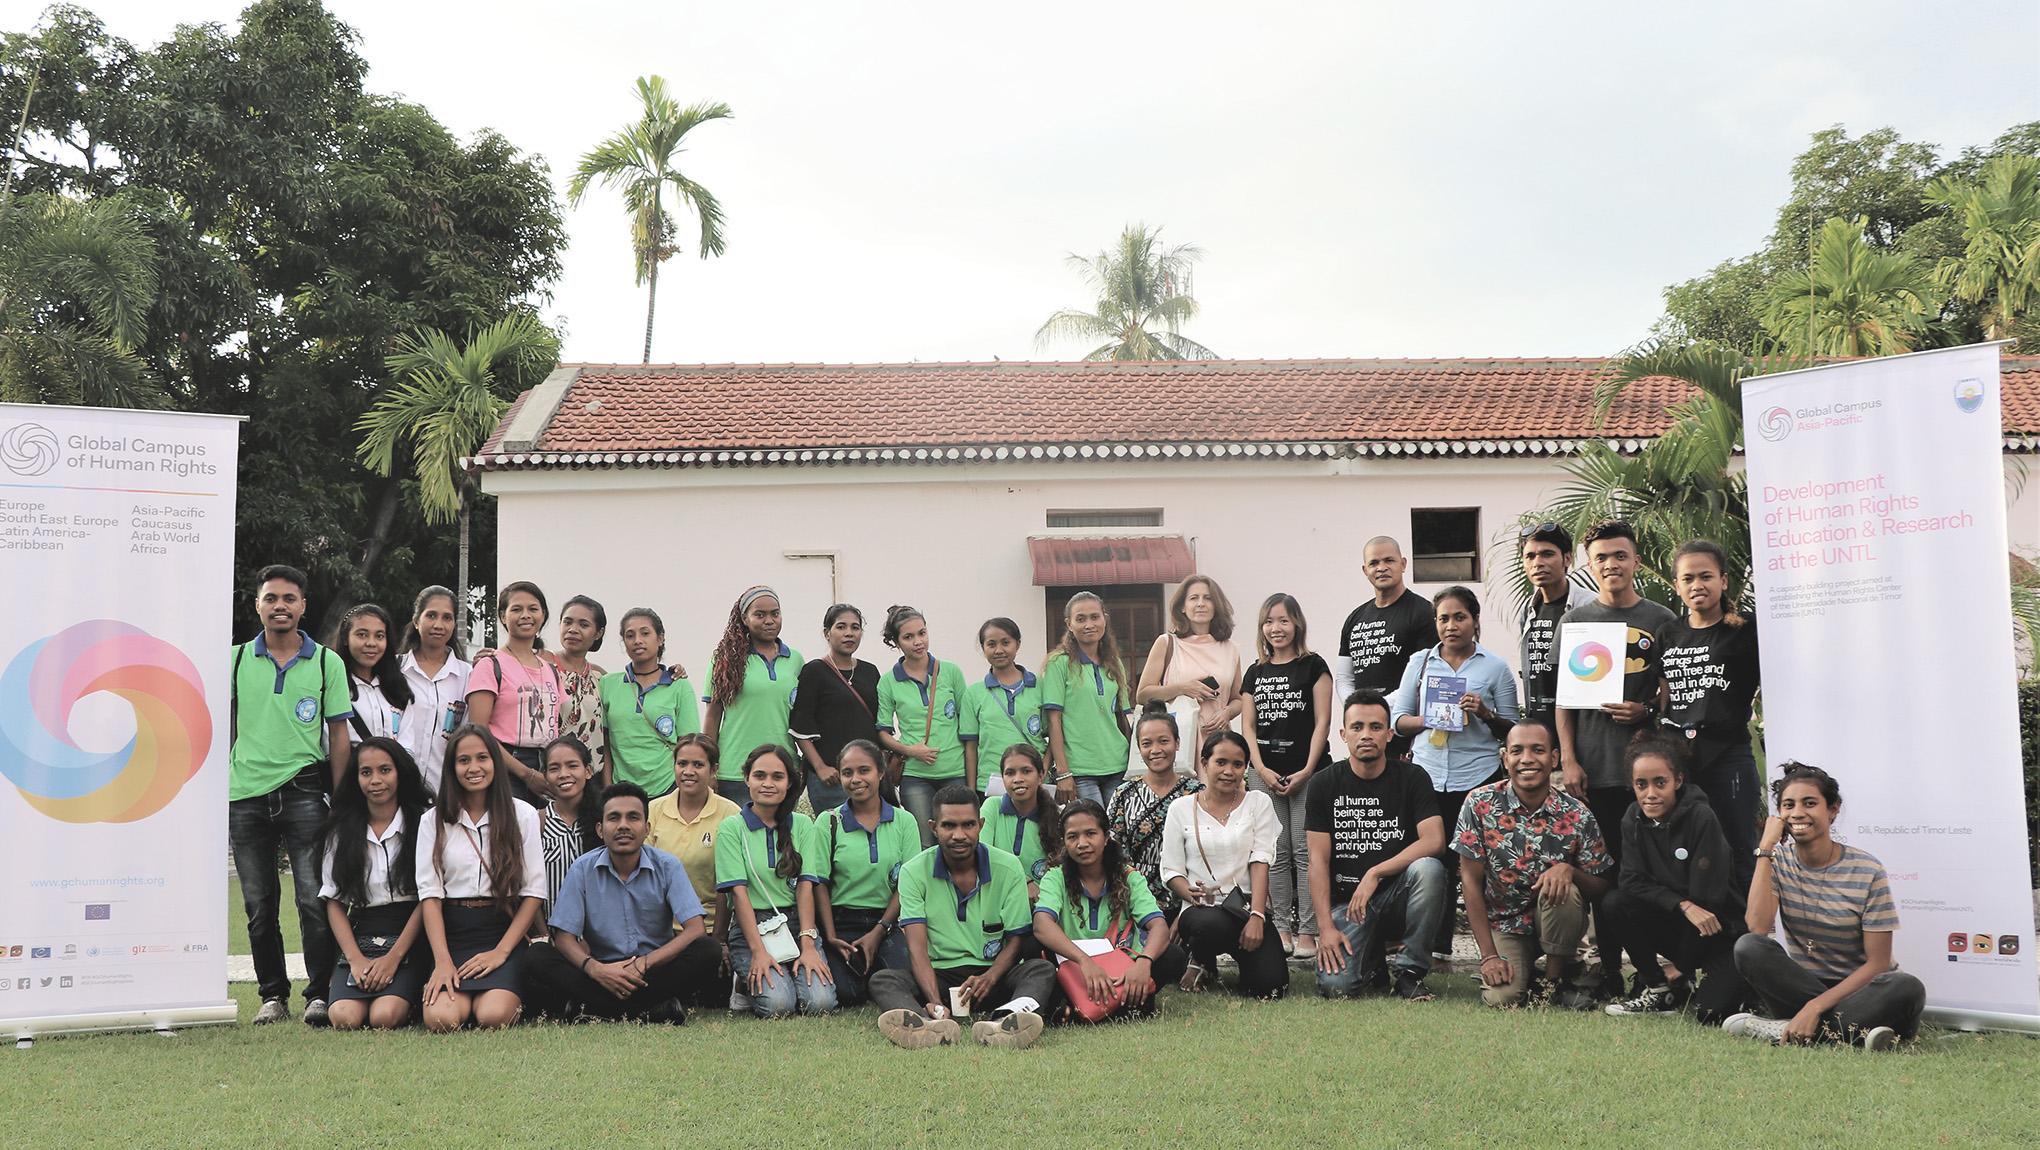 Inauguration Ceremony of the Human Rights Center at the Universidade Nacional Timor Lorosa'e